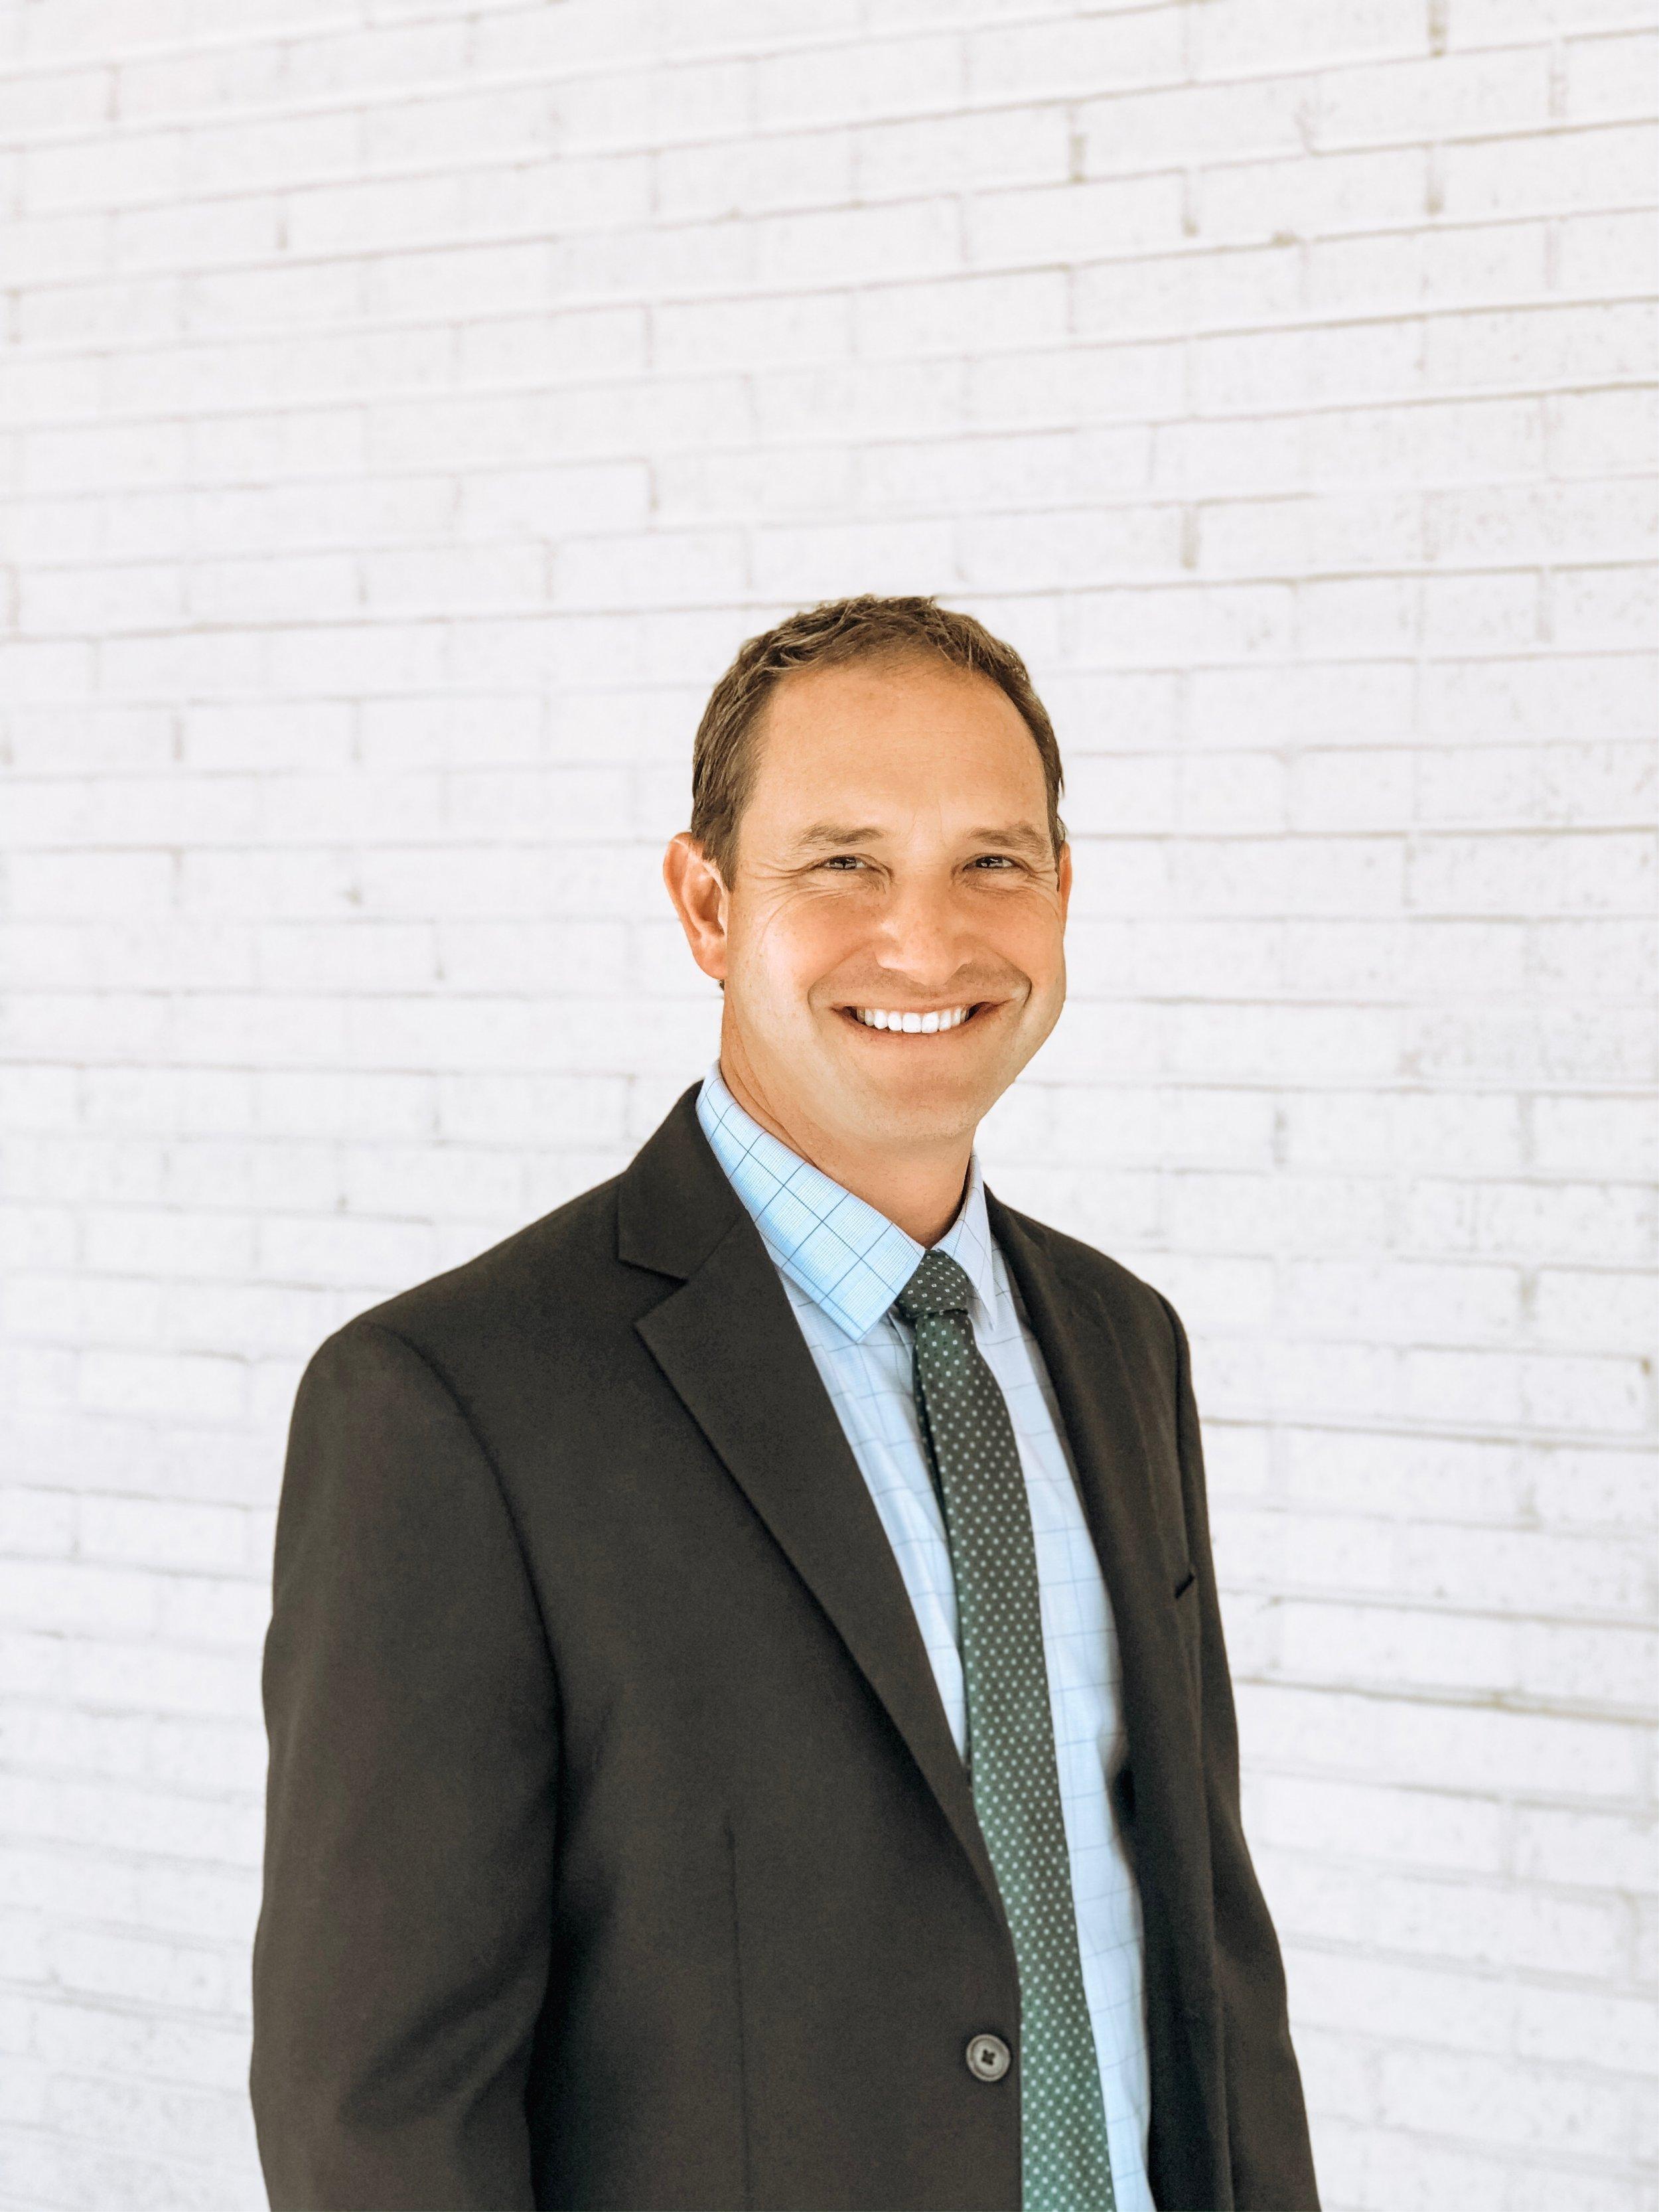 Zach Tarrant, Executive Director